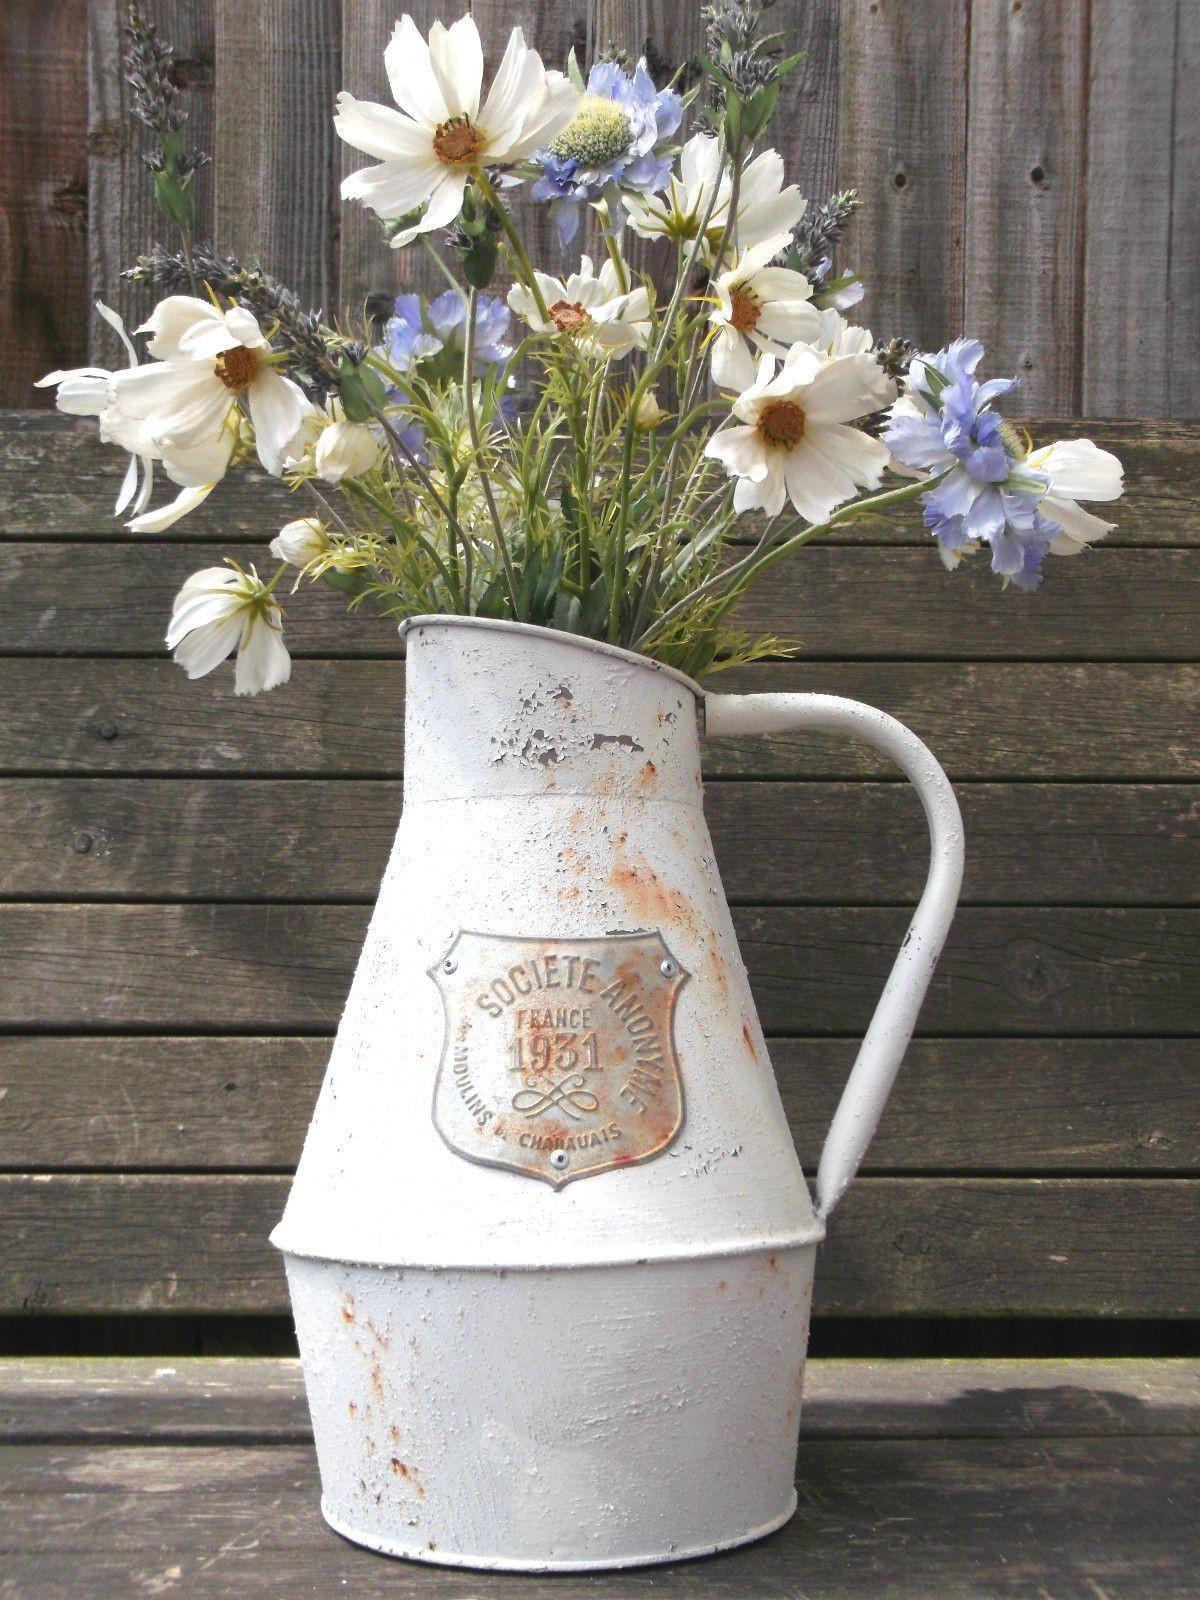 Wholesale Floor Vases Of 30 Copper Flower Vase the Weekly World Throughout French Flower Bucket H Vases Galvanized French Vase Tin Bucketi 0d